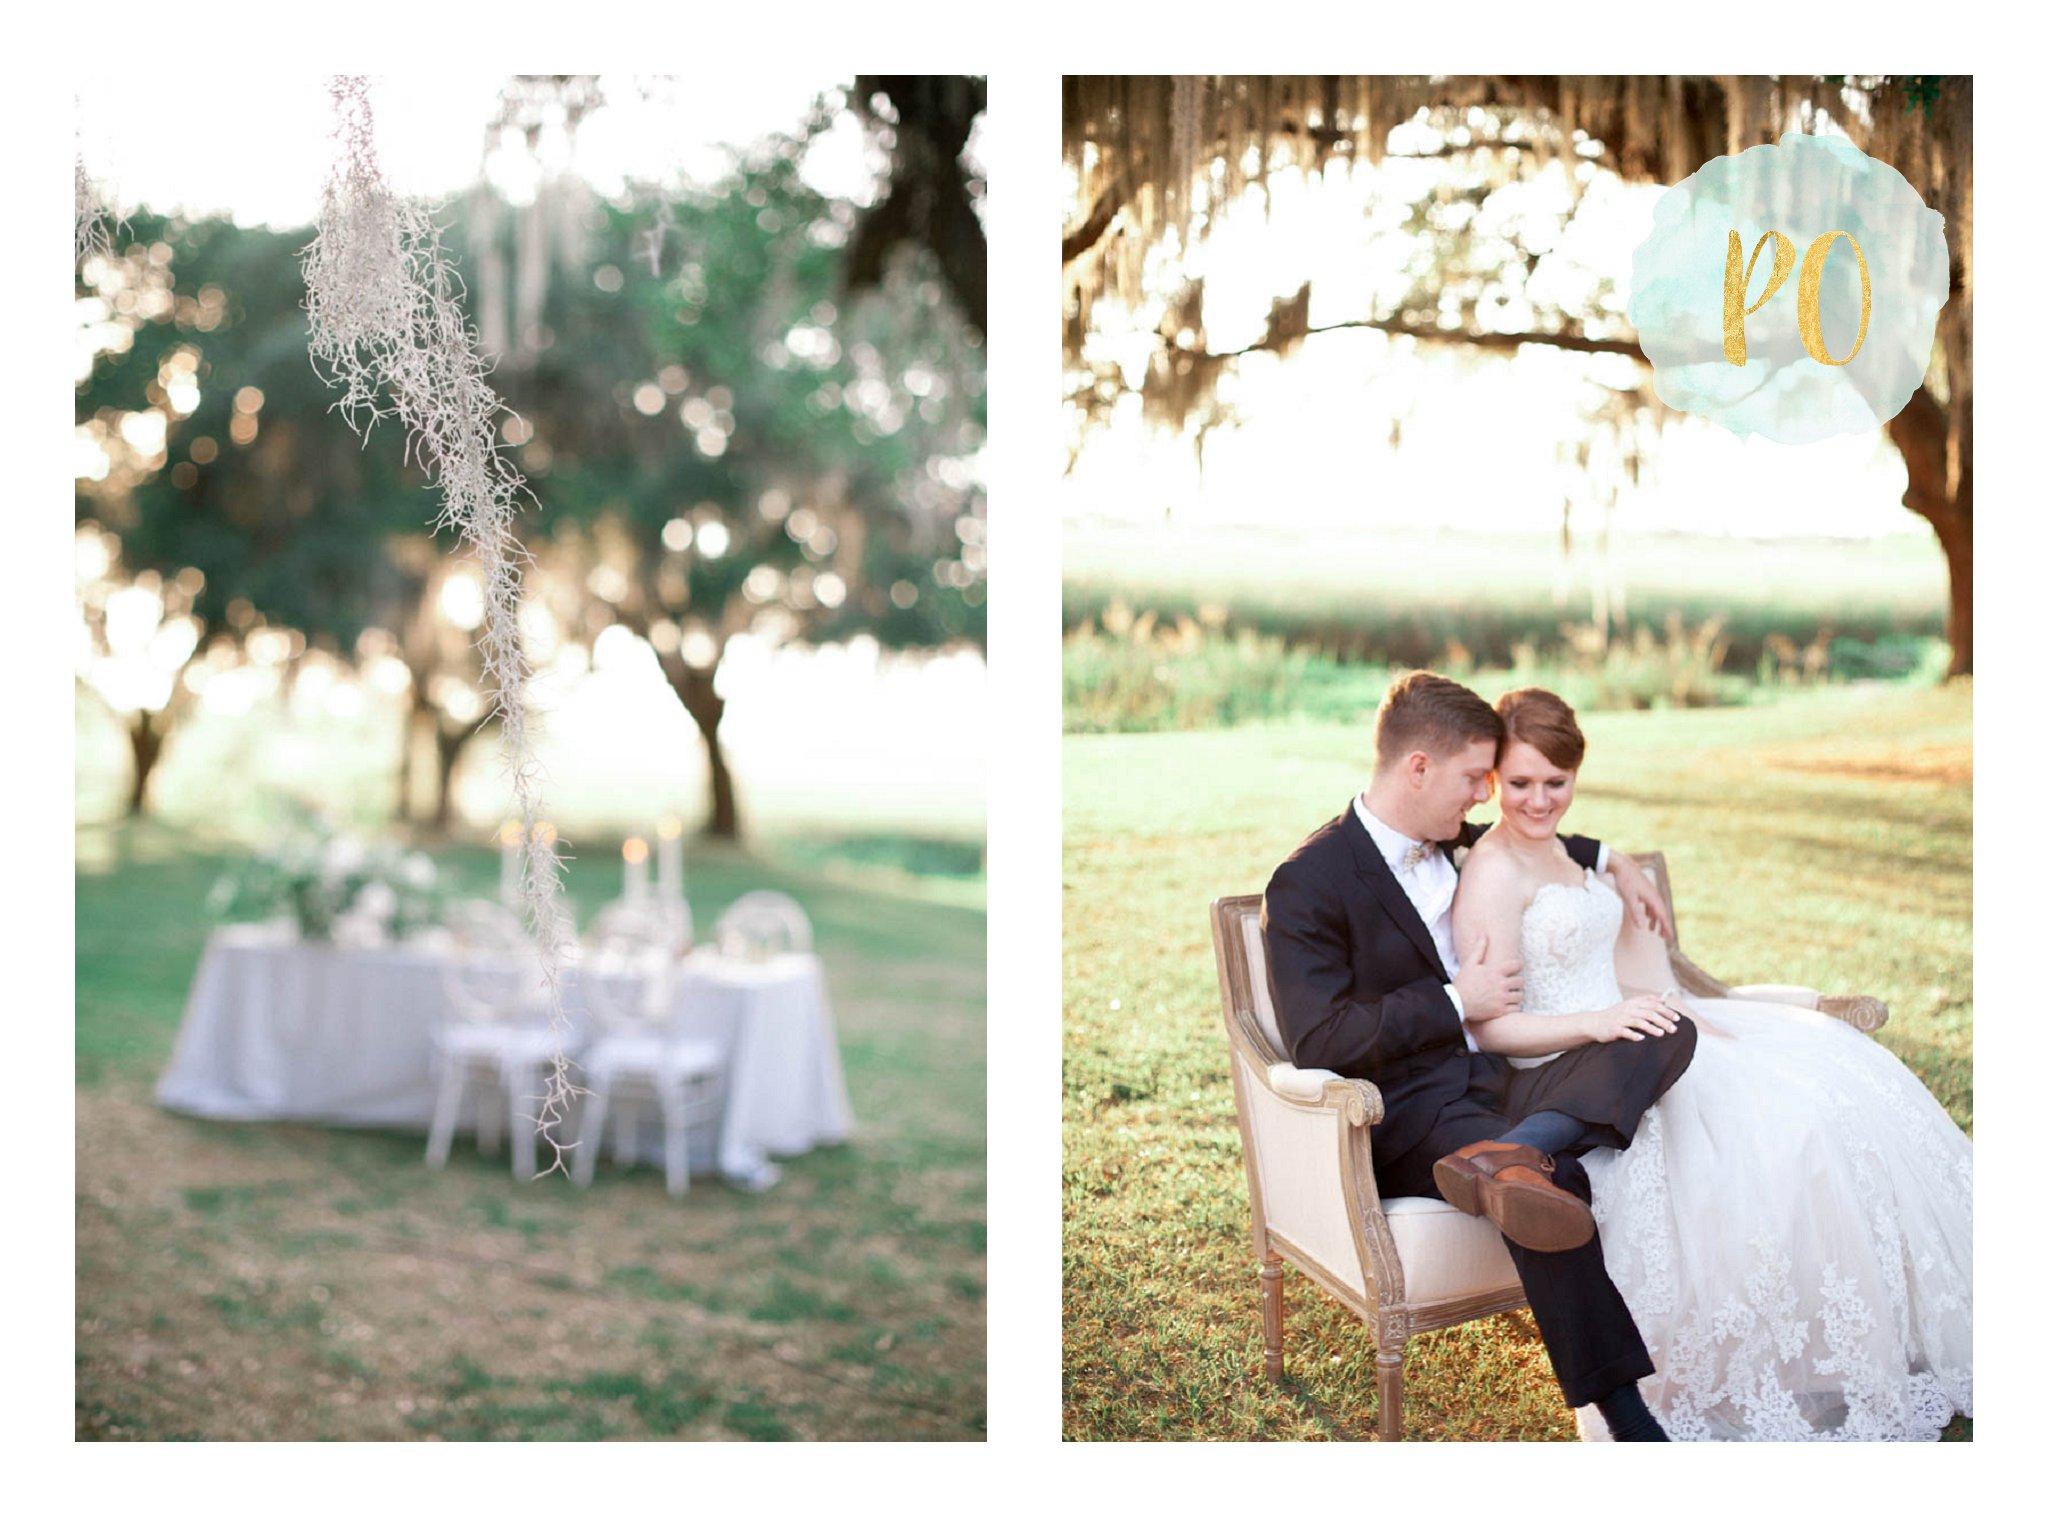 the-litchfield-plantation-pawleys-island-sc-wedding-photos_0062.jpg